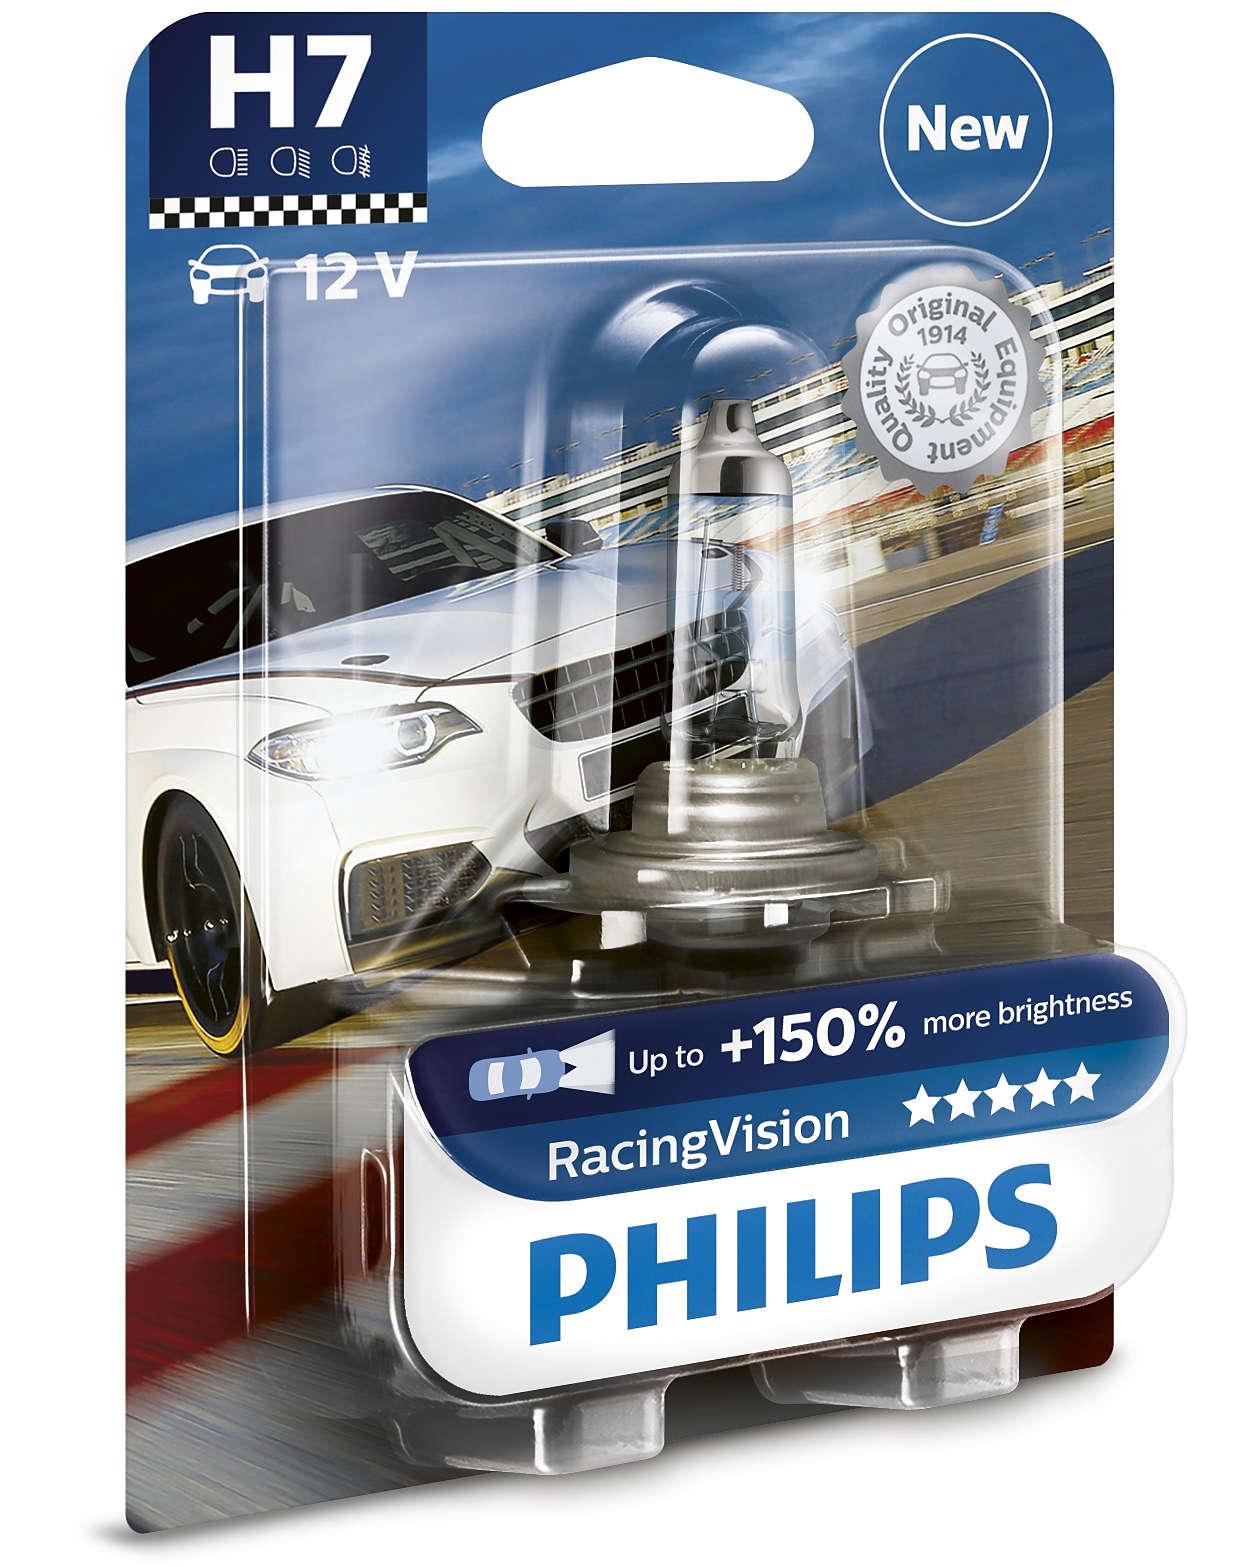 1ks iarovka h7 philips racing vision 12v 55w px26d. Black Bedroom Furniture Sets. Home Design Ideas